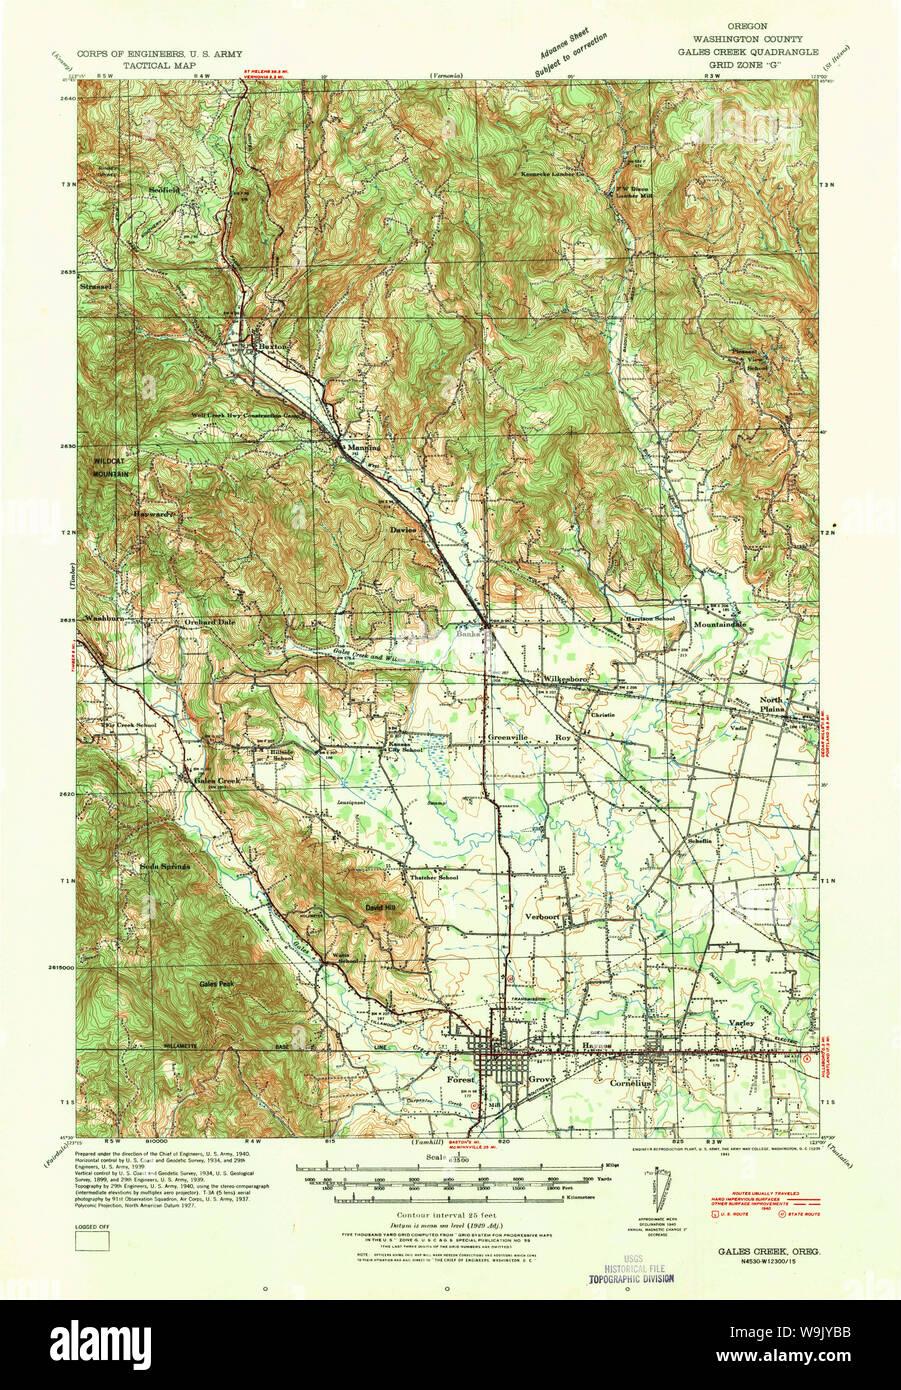 gales creek oregon map Usgs Topo Map Oregon Gales Creek 282508 1941 62500 Restoration gales creek oregon map